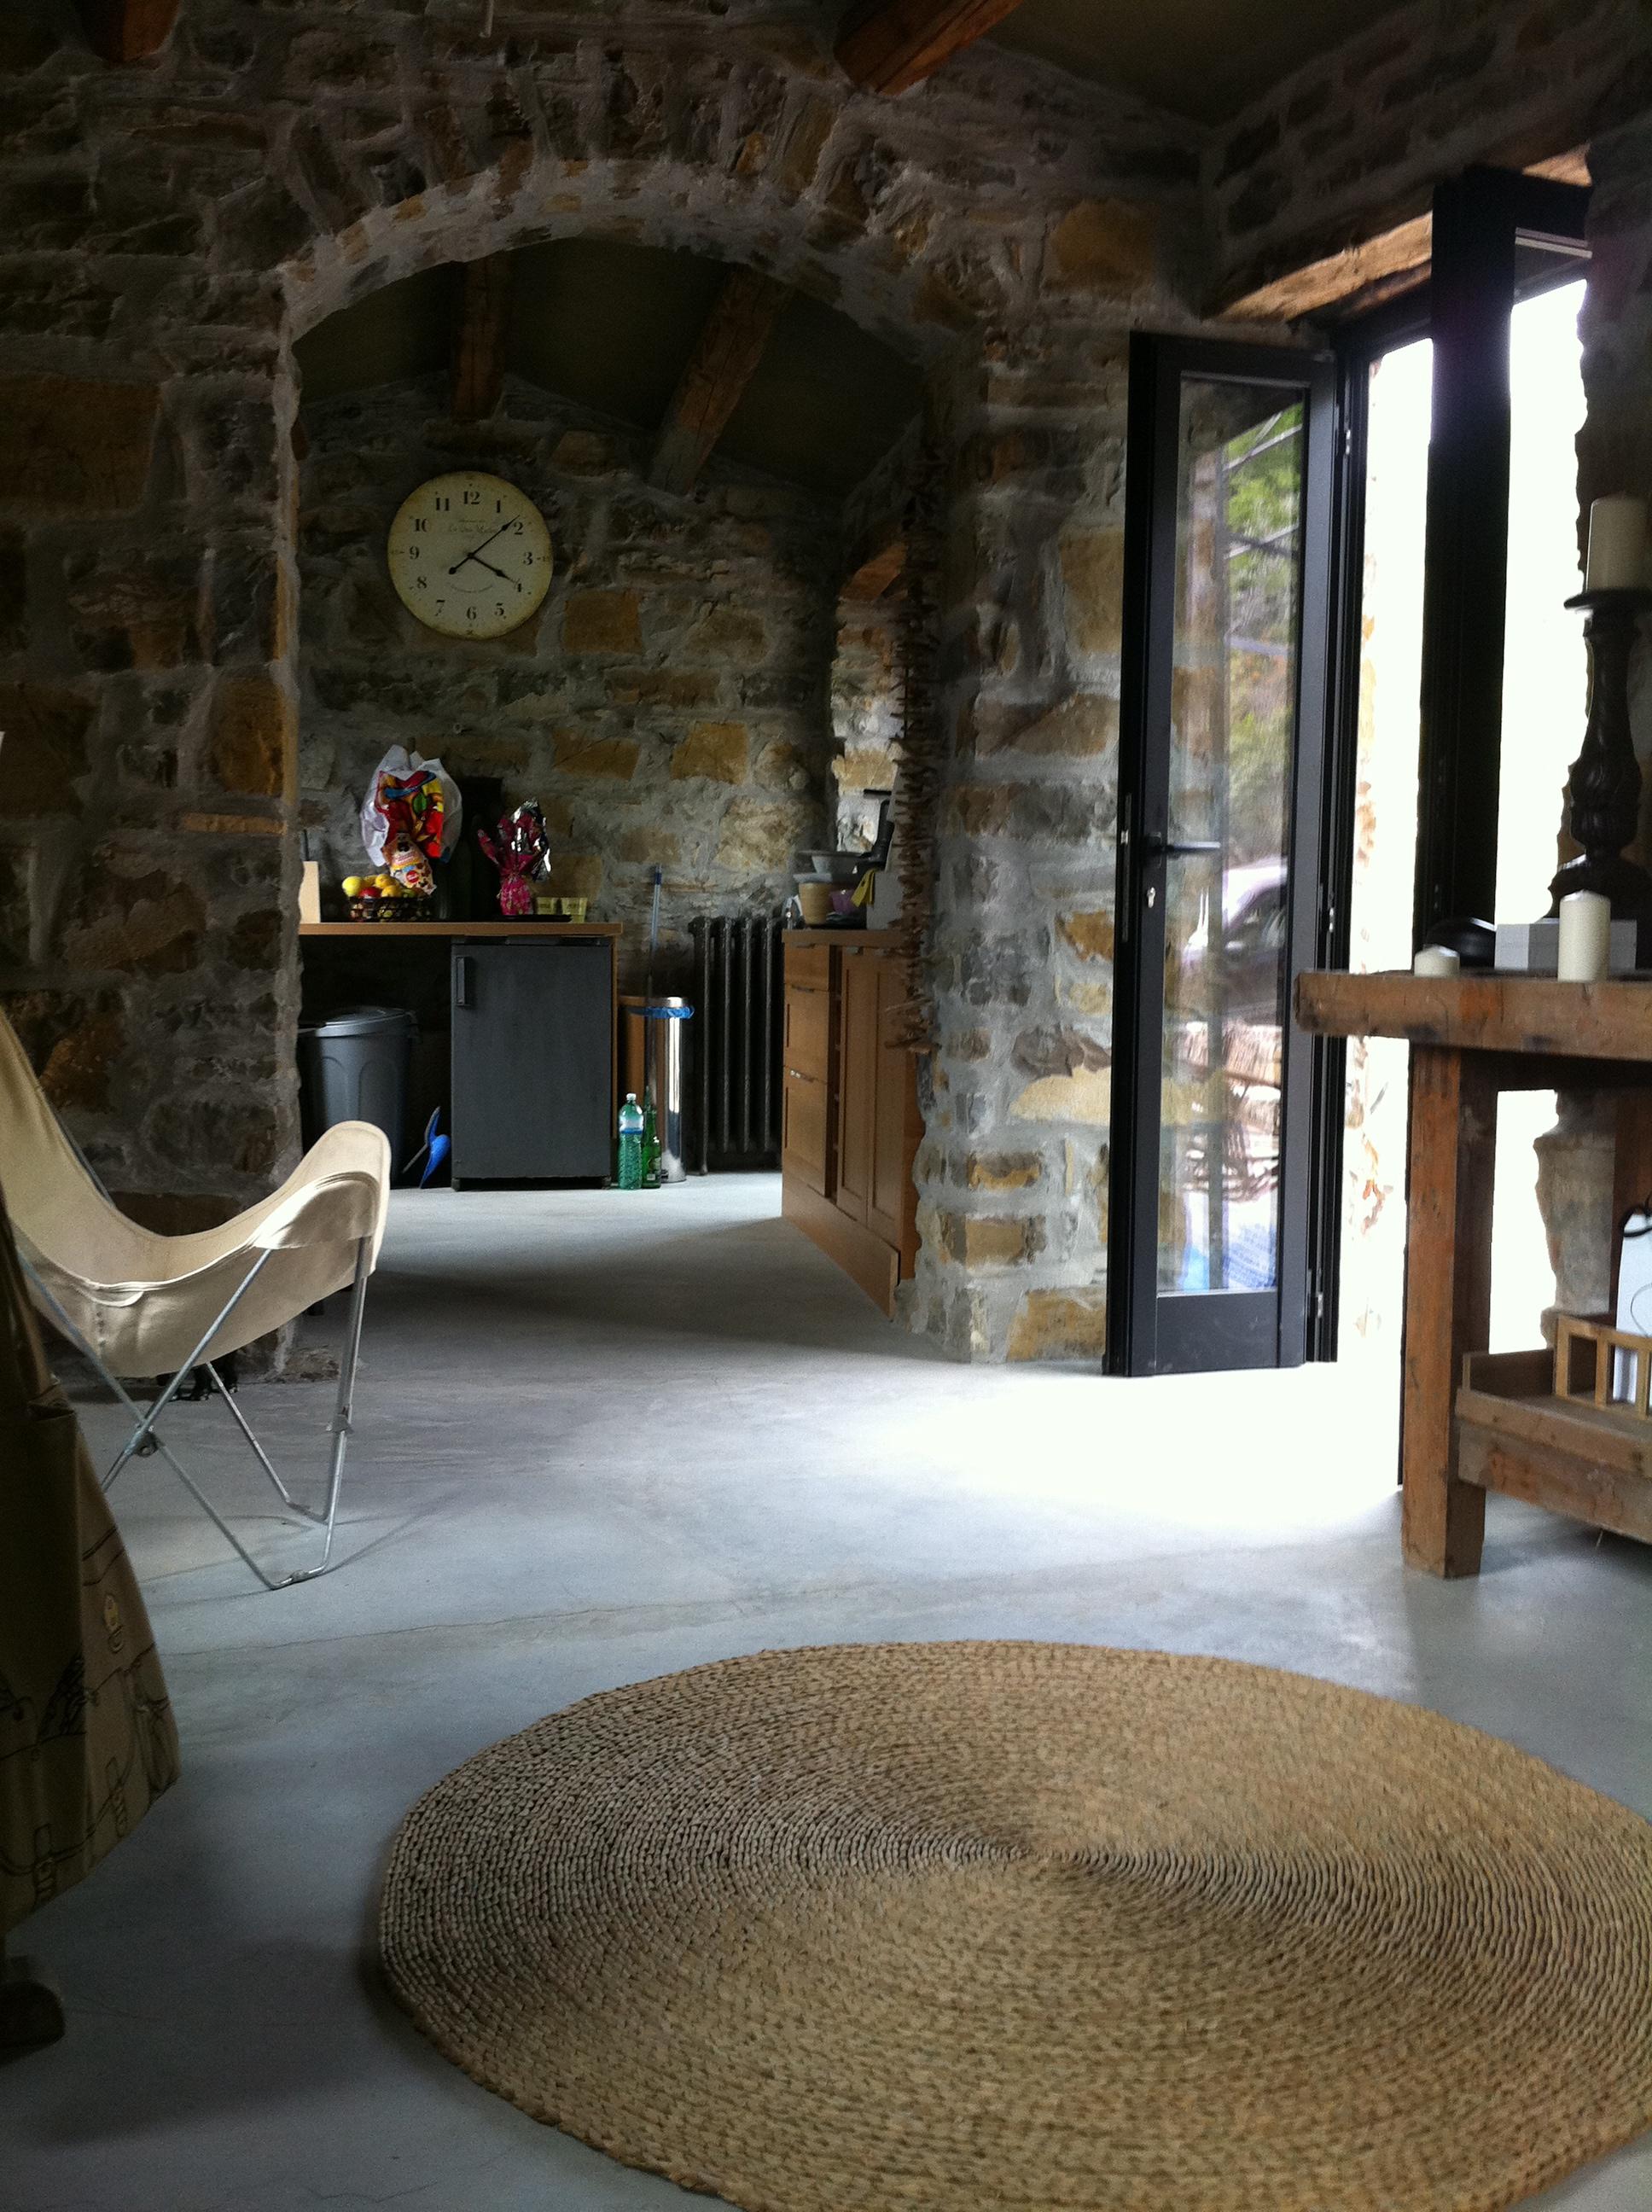 House of stone charm of Italy - Casas en renta en Apricale